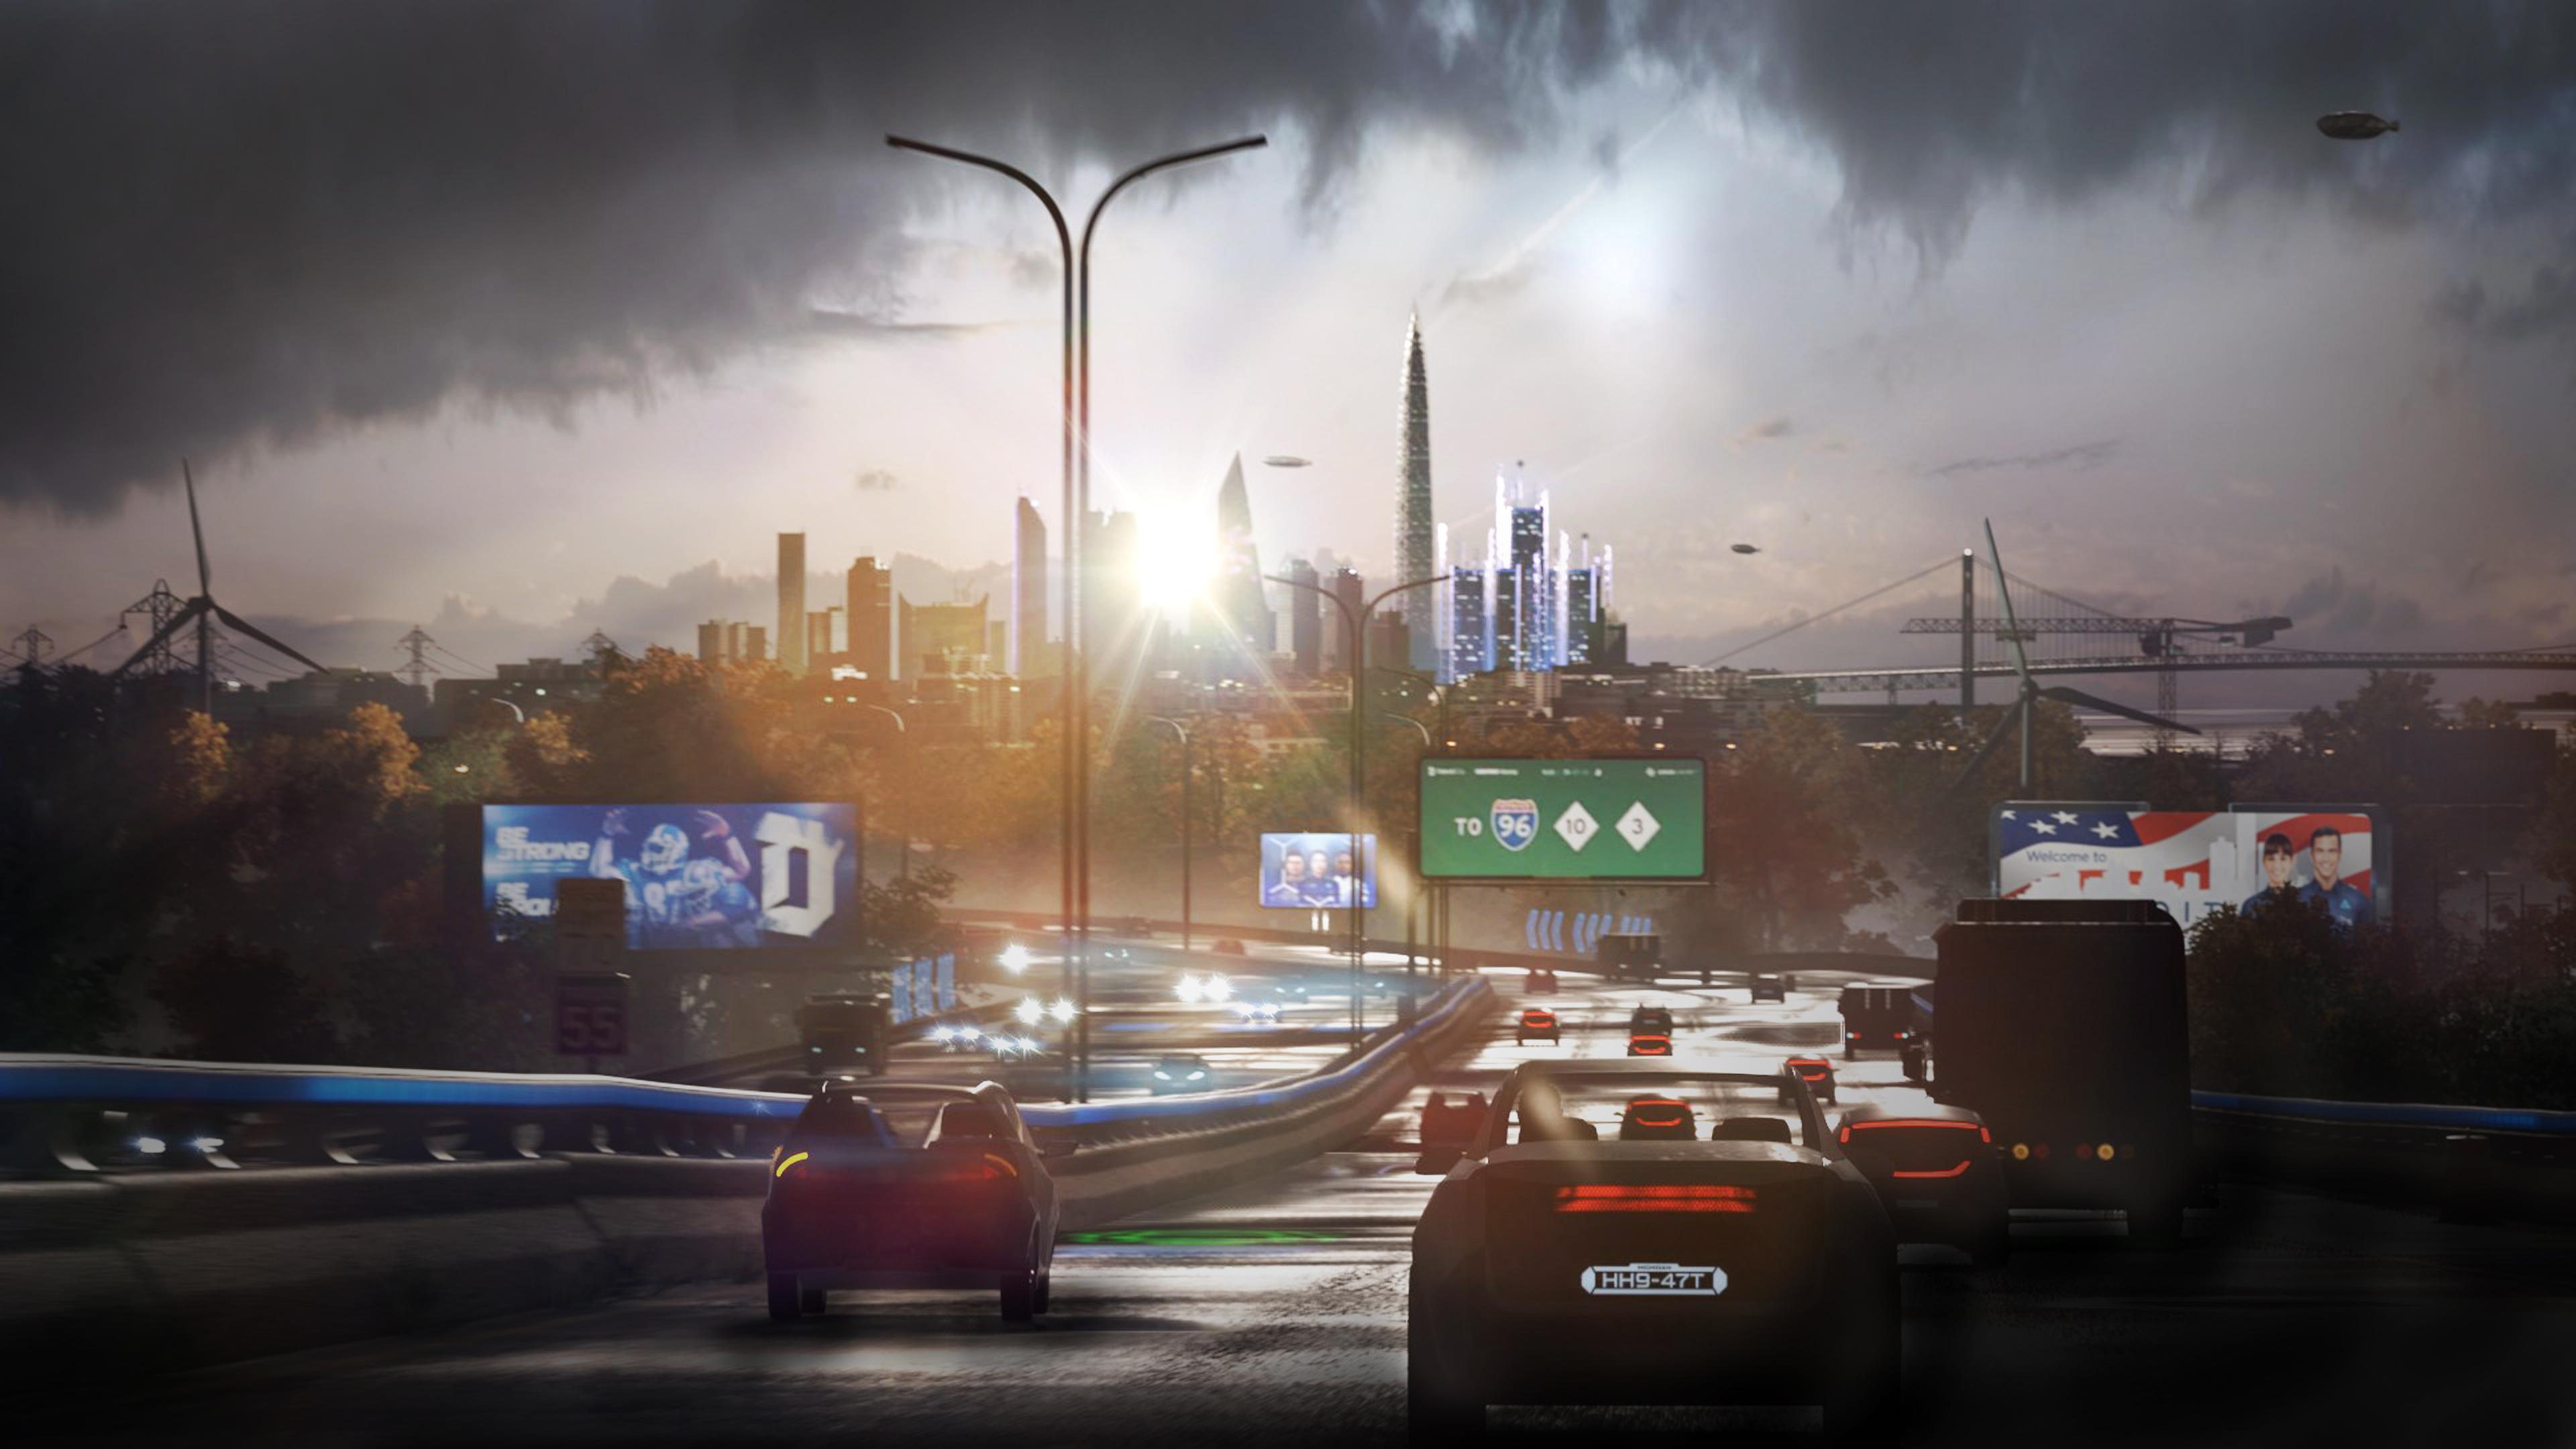 Detroit Become Human Hd Wallpaper: Detroit Become Human City View Vehicles 4k, HD Games, 4k